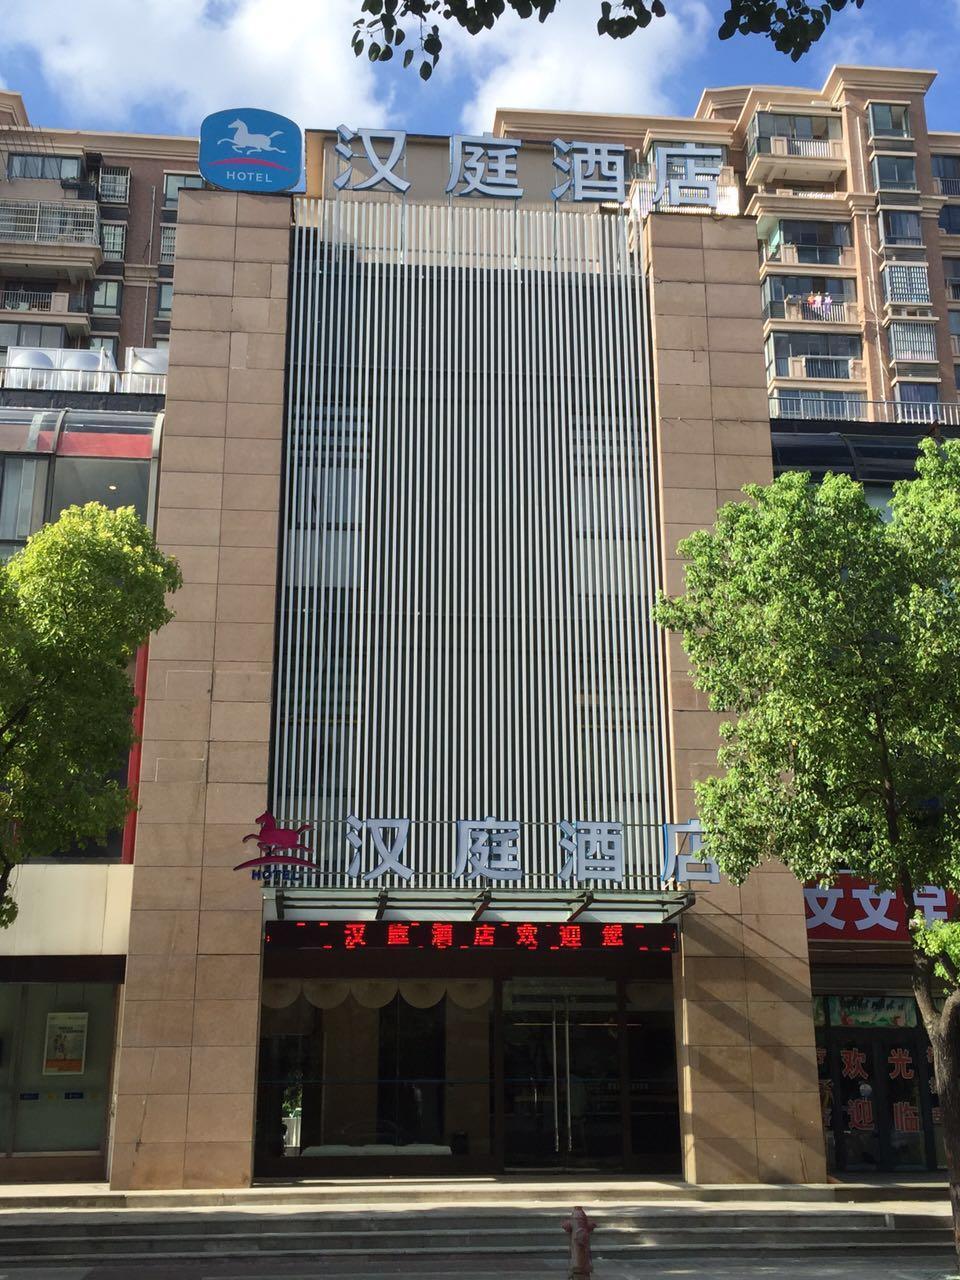 Hanting Hotel Shanghai Fengzhuang